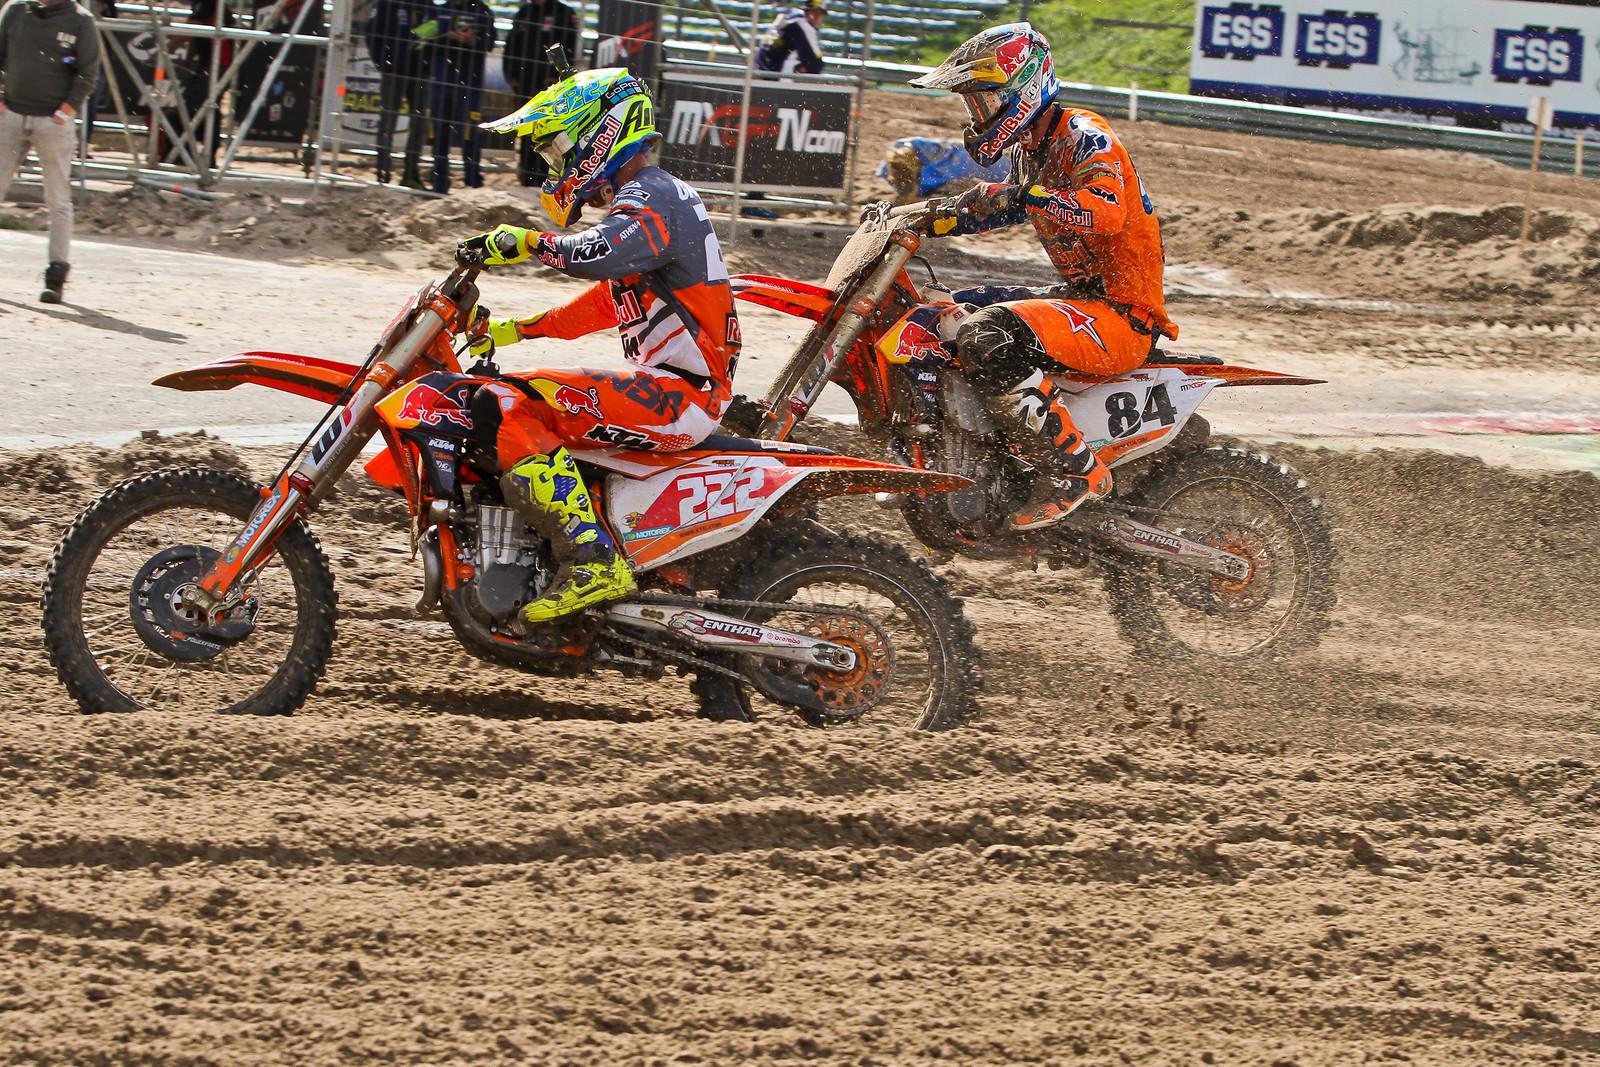 Antonio Cairoli vs Jeffrey Herlings - ayearinmx - Motocross Pictures - Vital MX